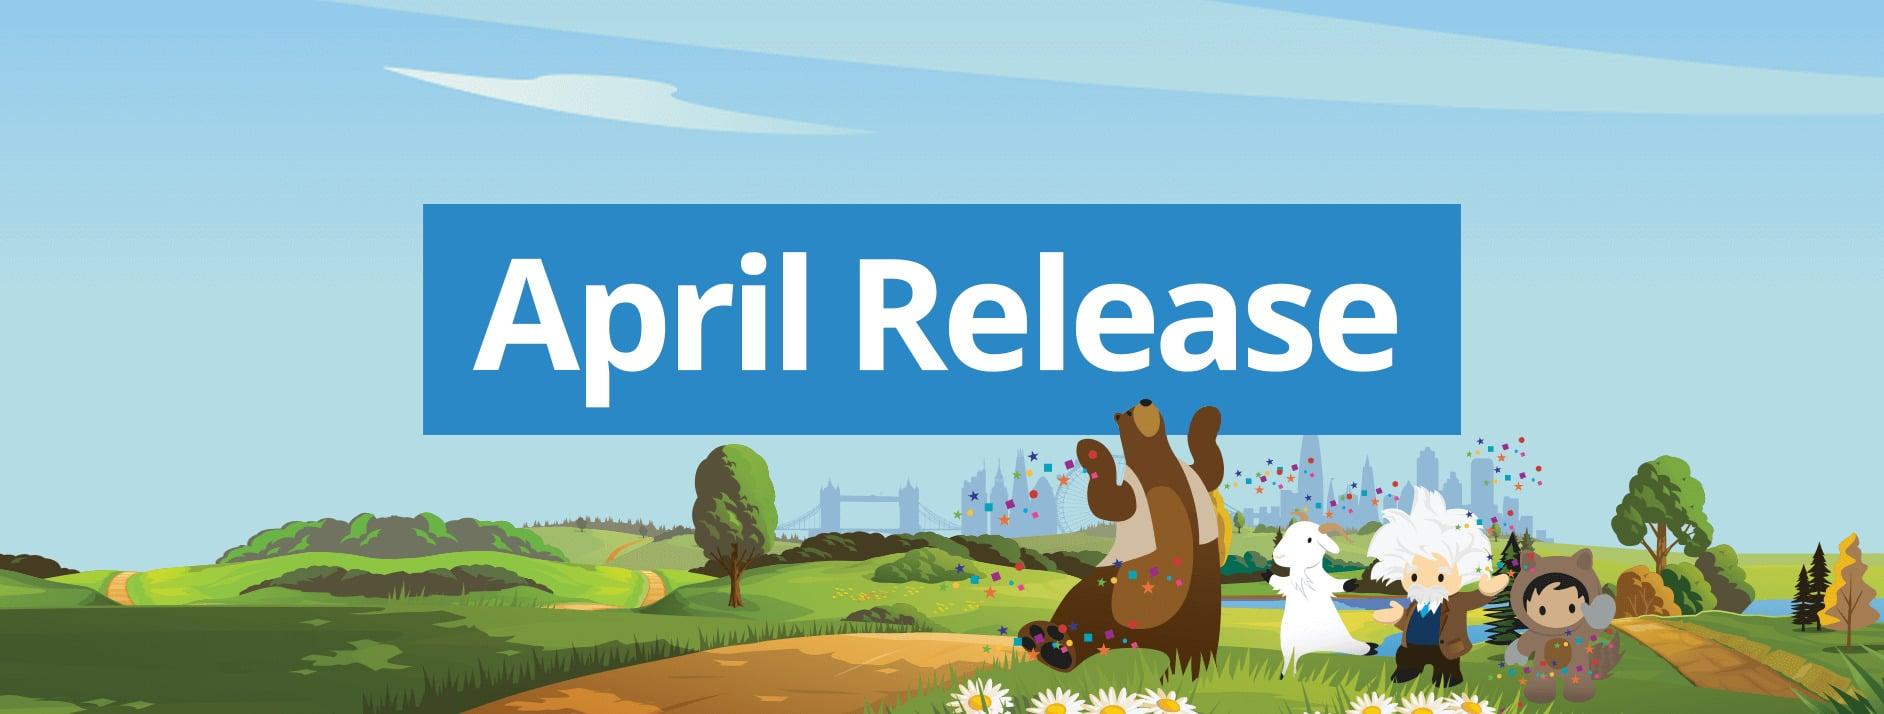 Release Nétive VMS april